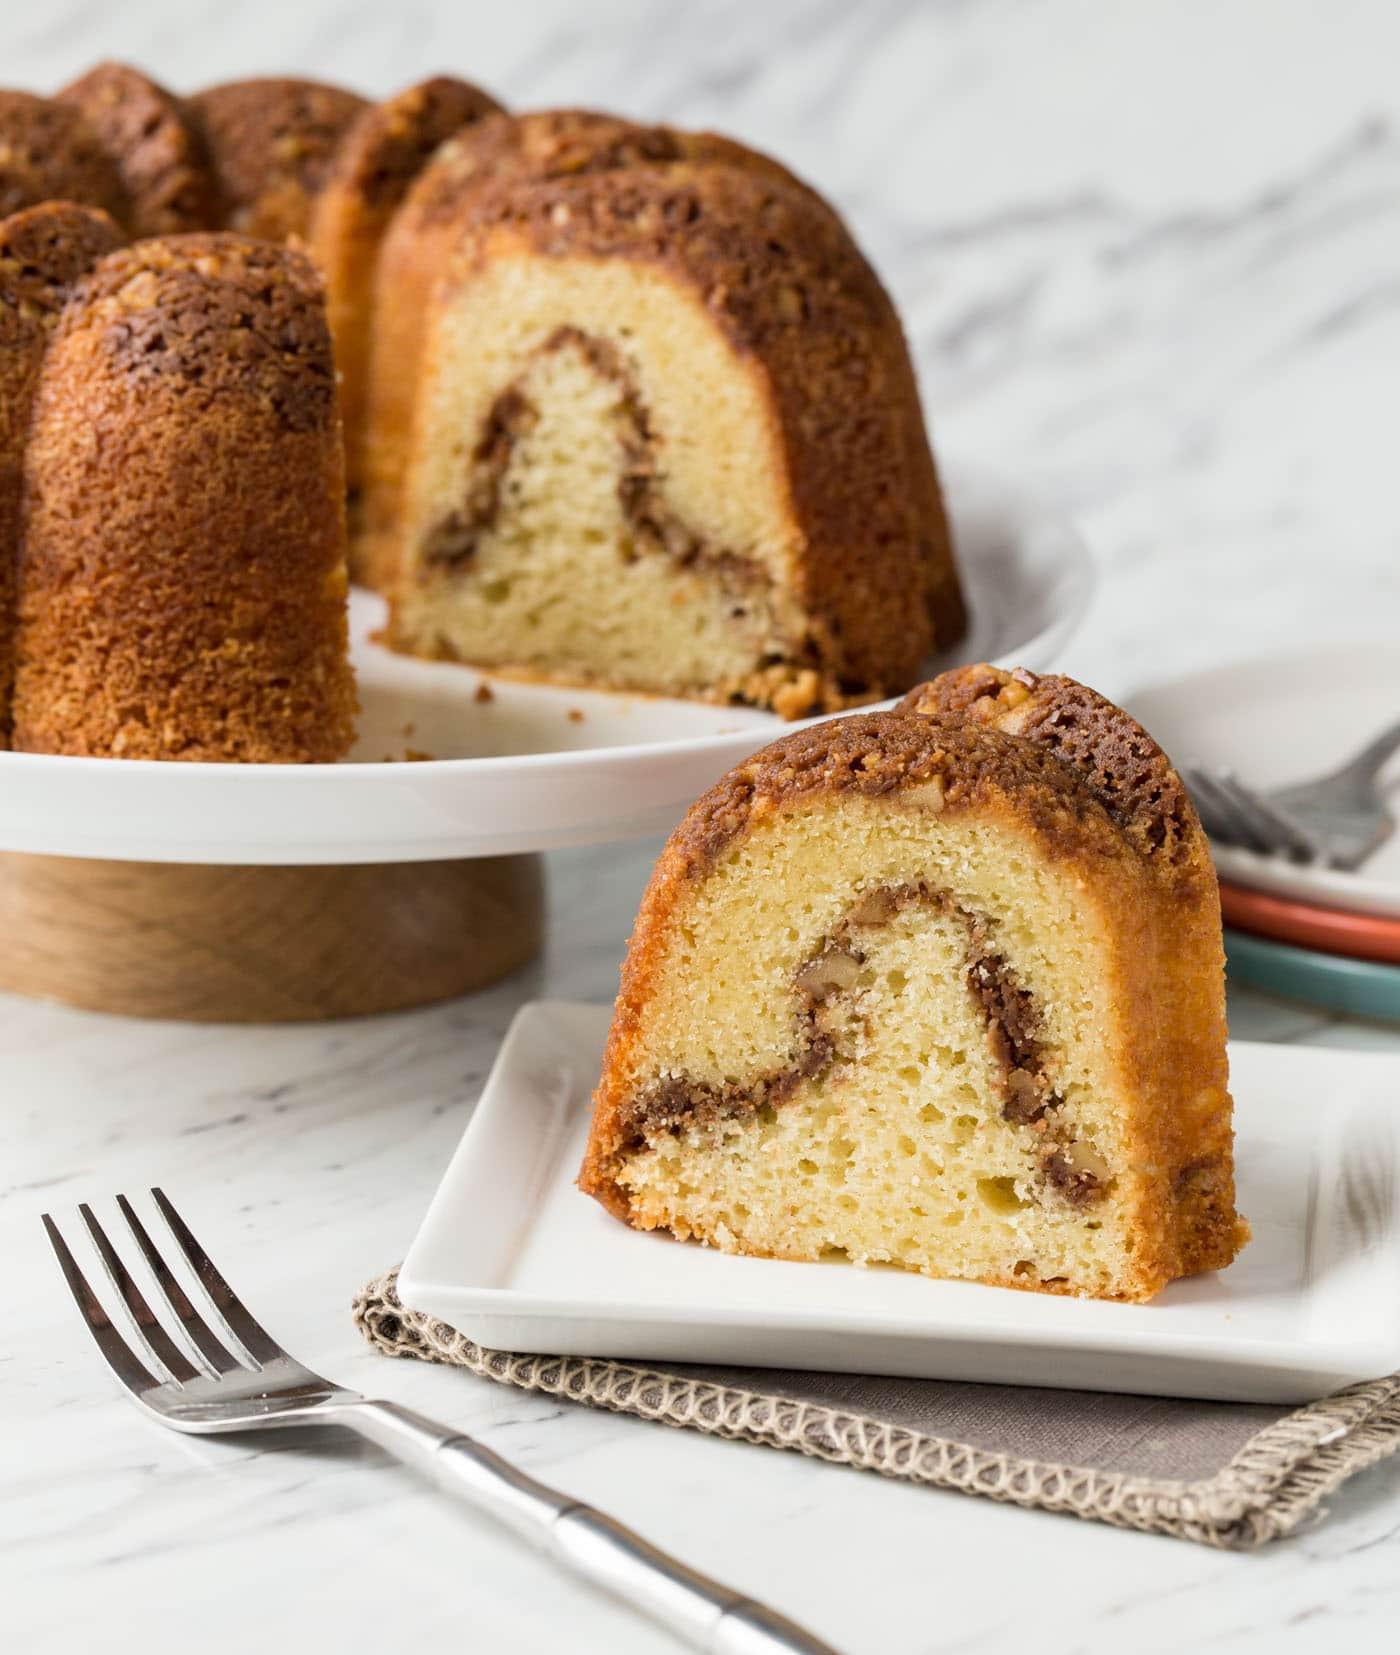 Sour Cream Coffee Cake  Grandma s Sour Cream Coffee Cake Garnish with Lemon